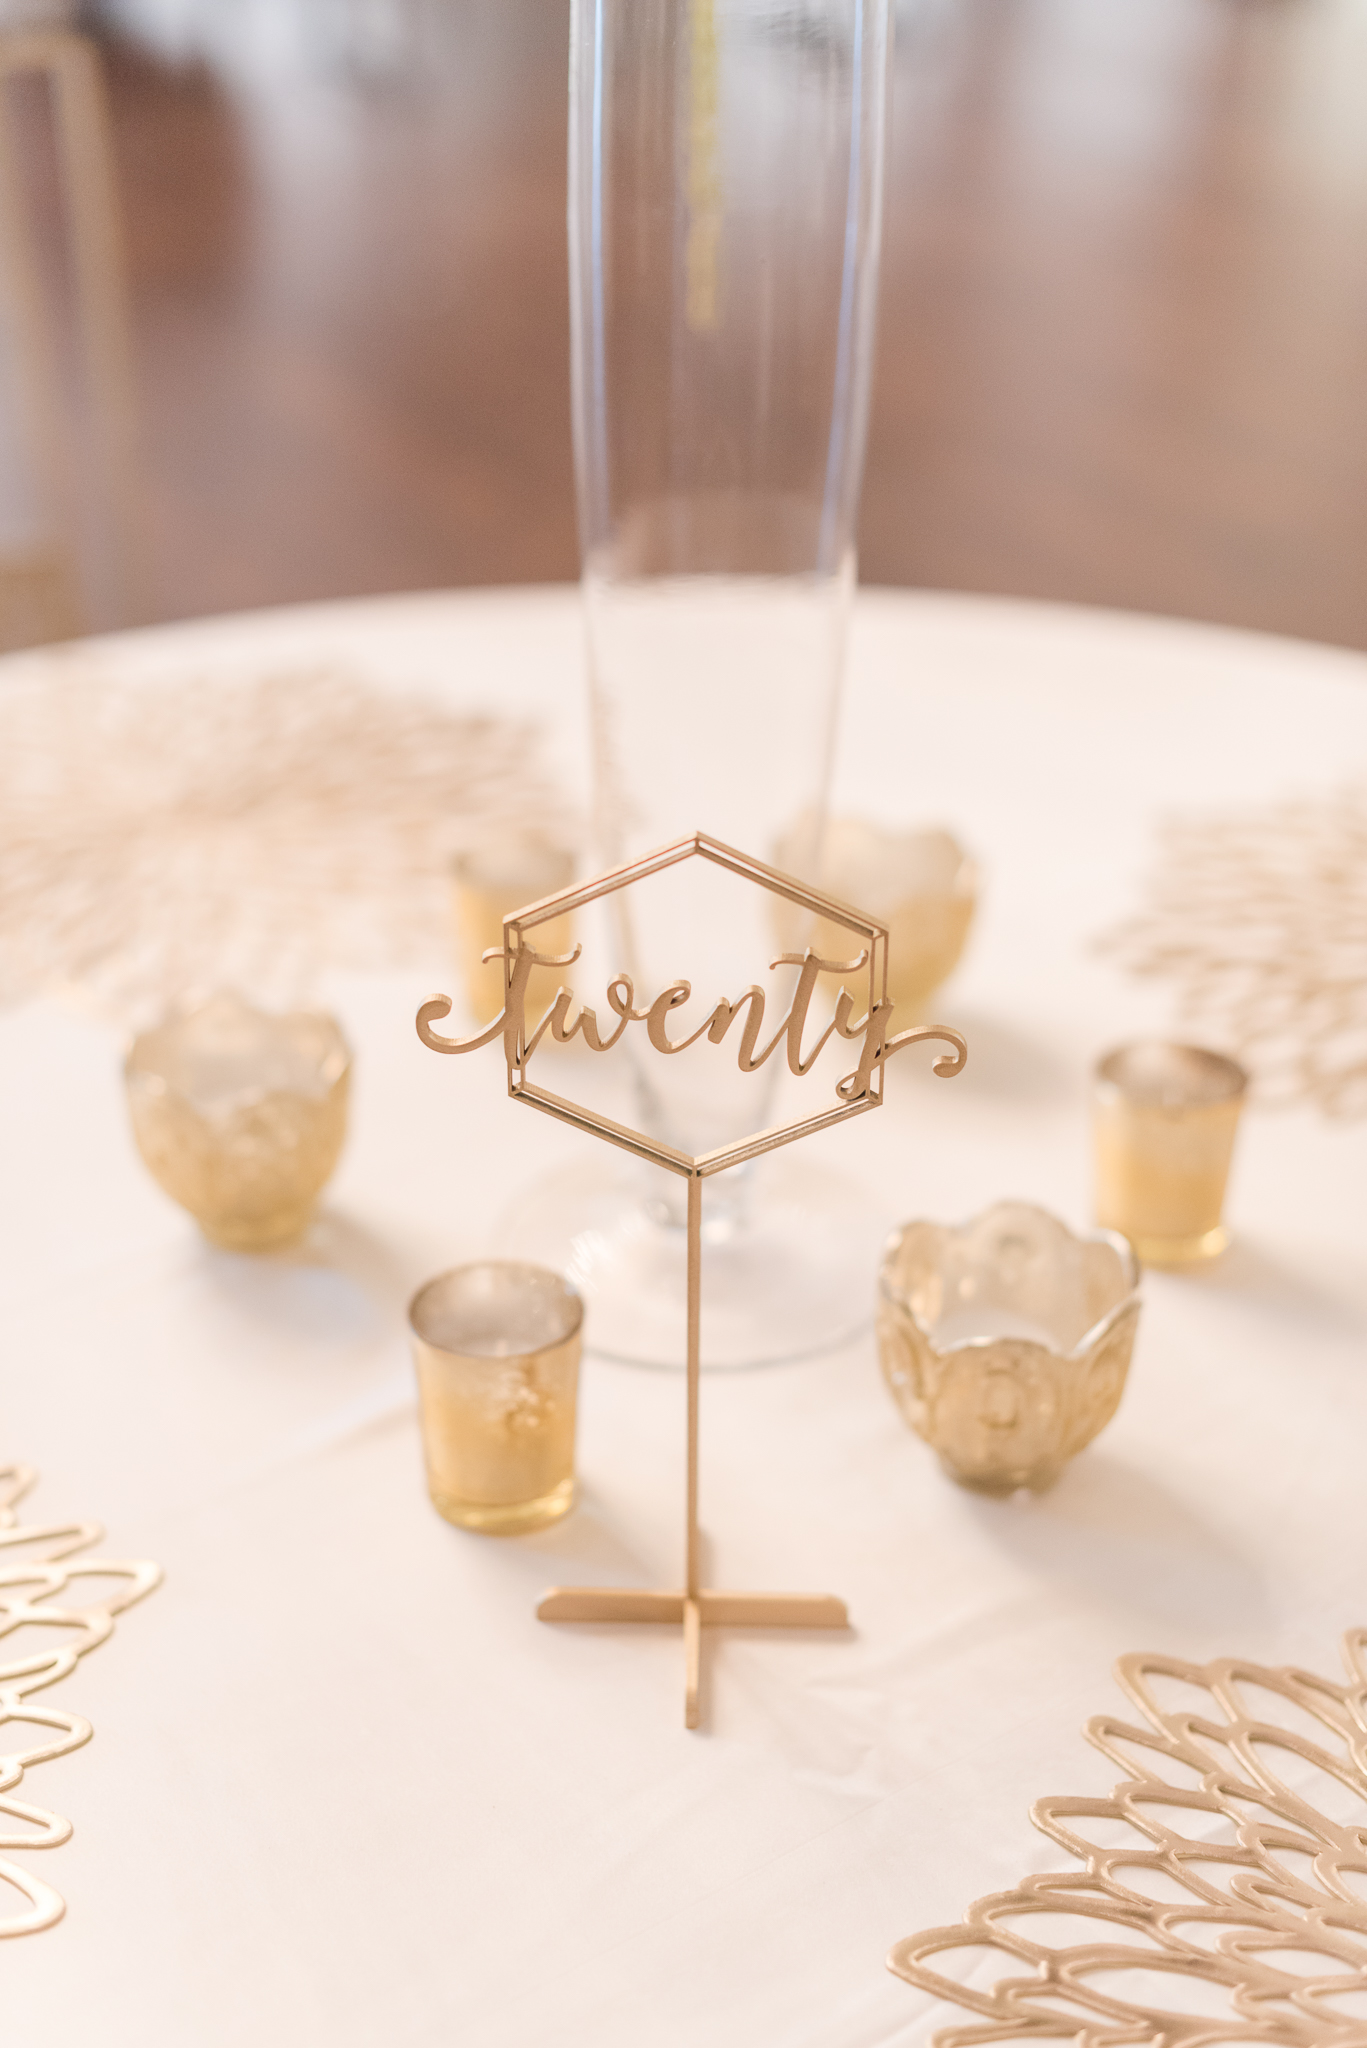 Black Iris Estate Wedding Elegant White with Greenery Luxury High End Flowers-11.jpg